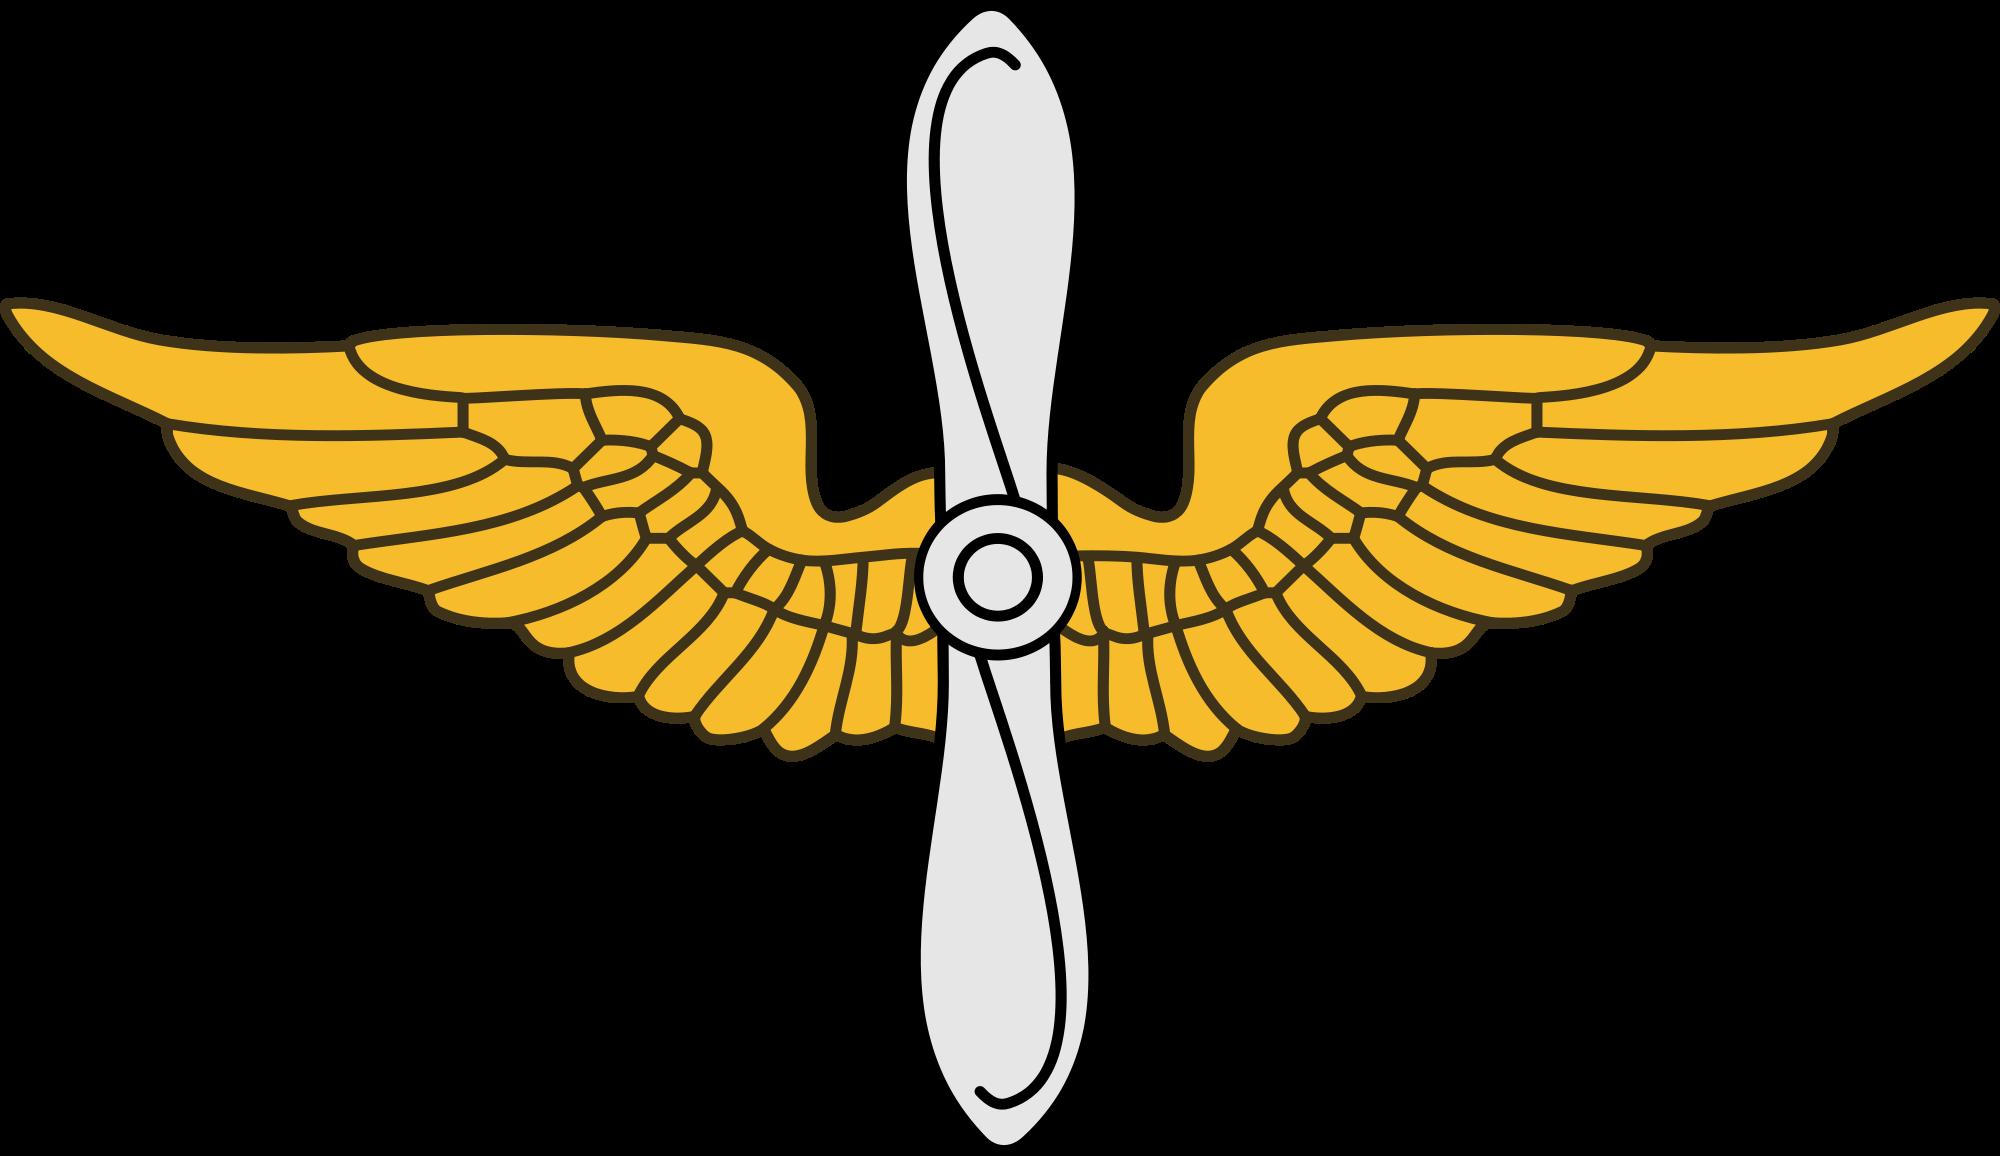 Pilot clipart aviator pilot. File us army aviation